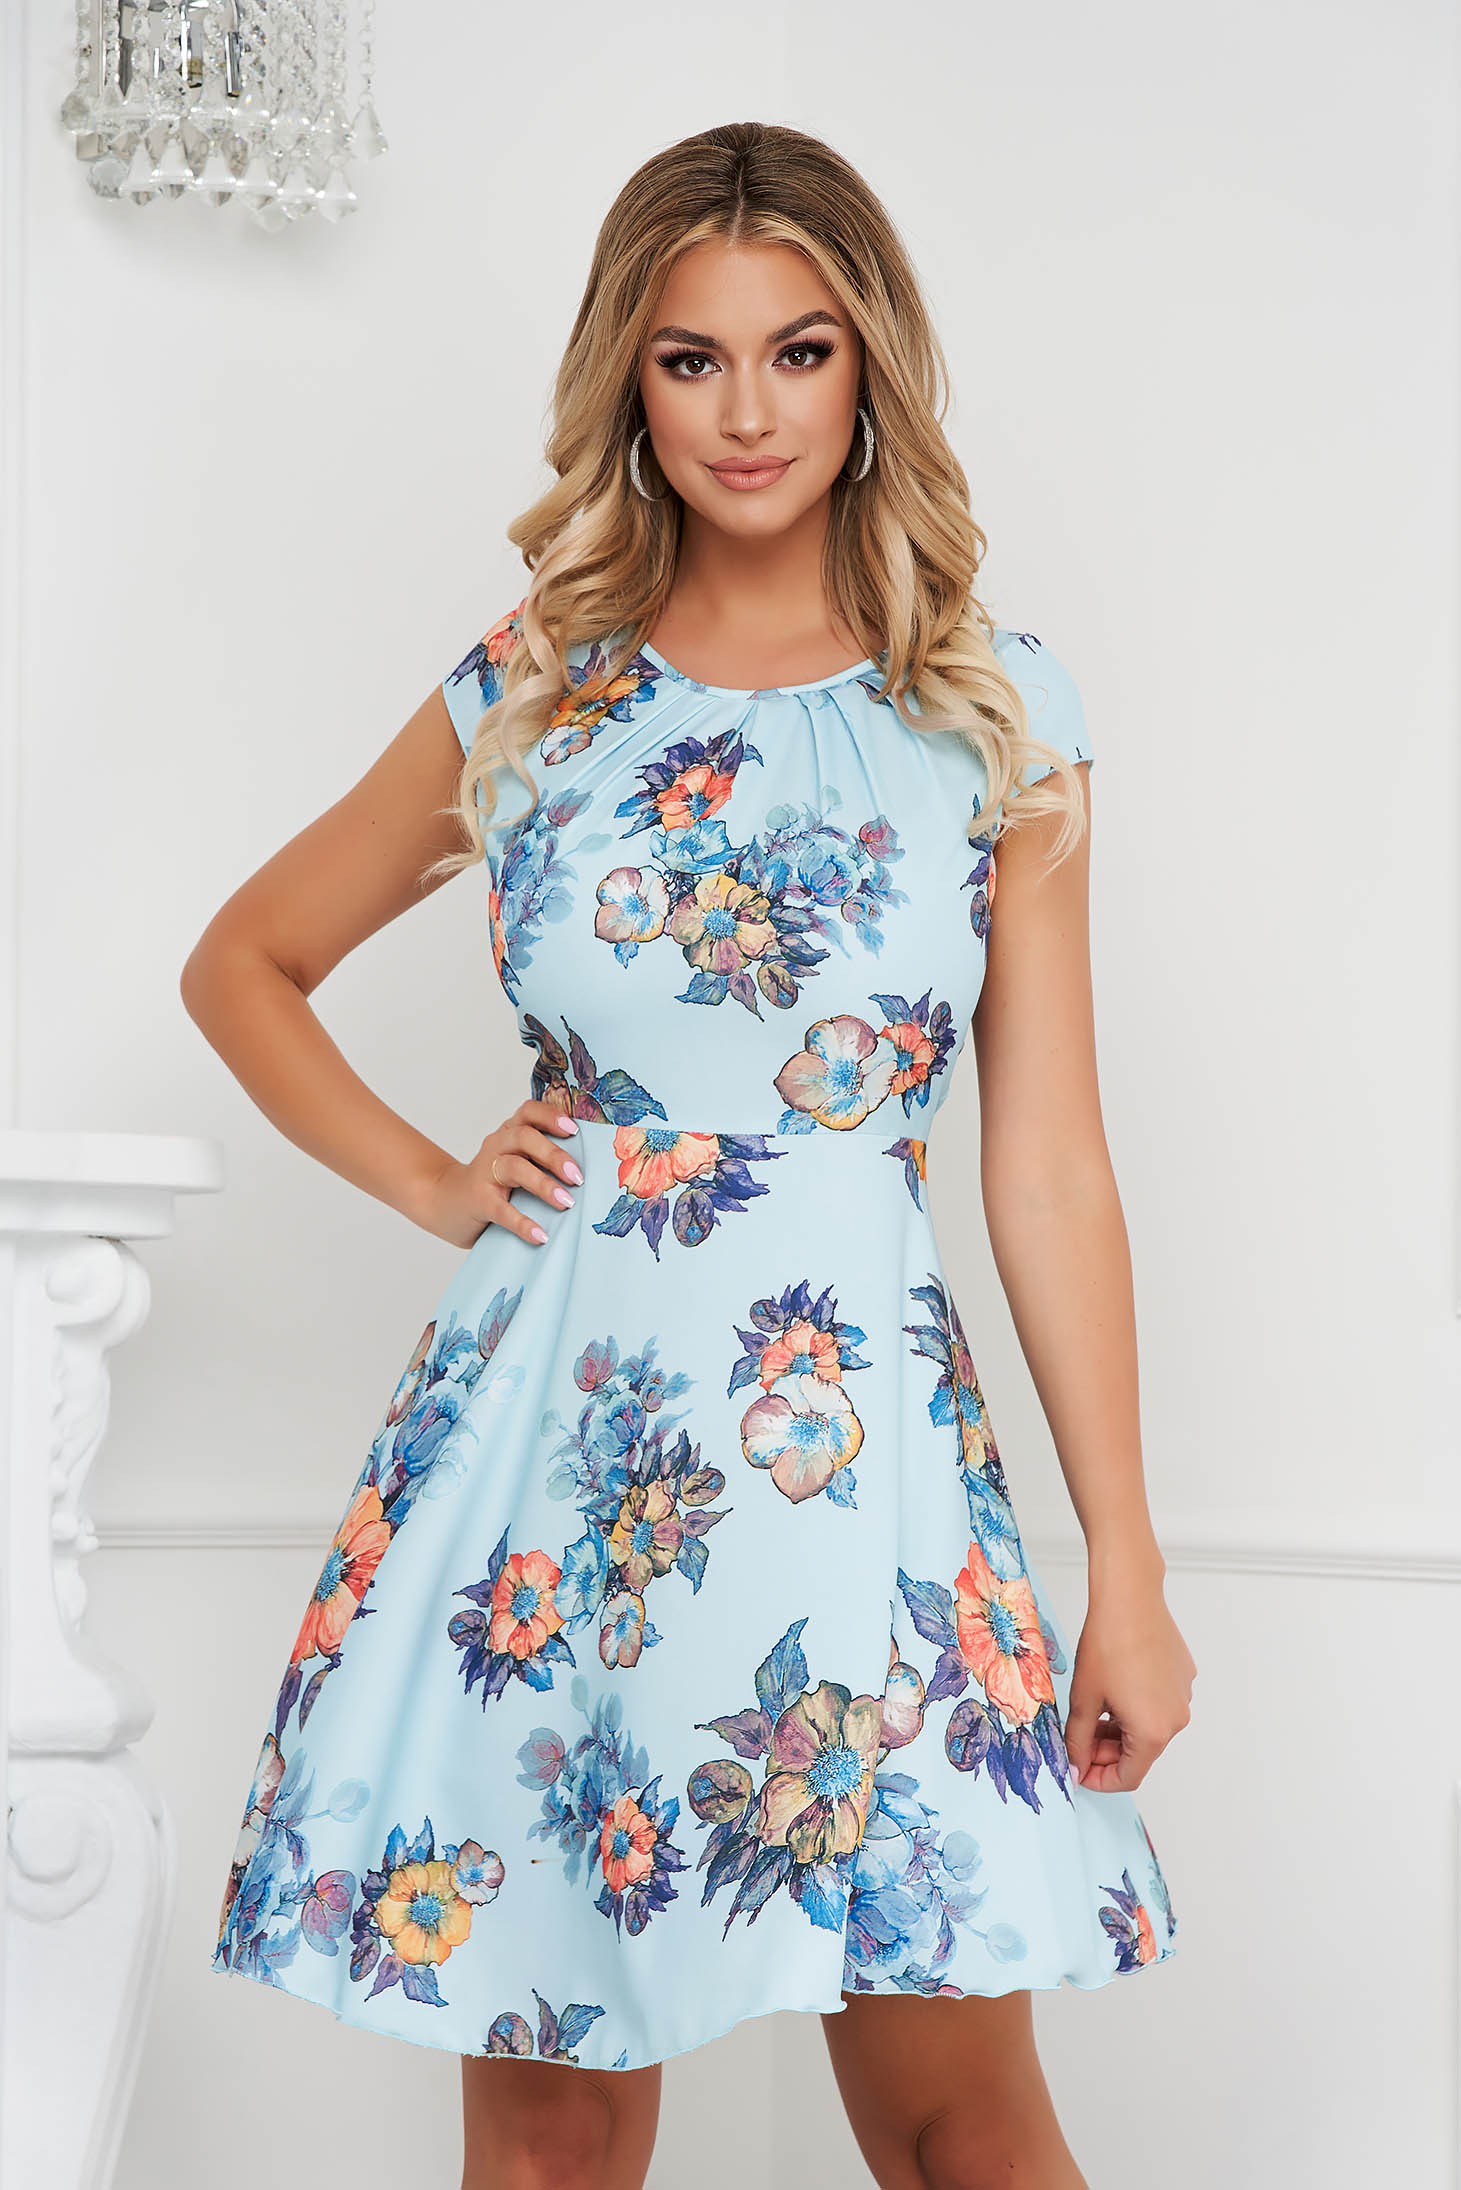 Lightblue dress elegant short cut cloche airy fabric short sleeves